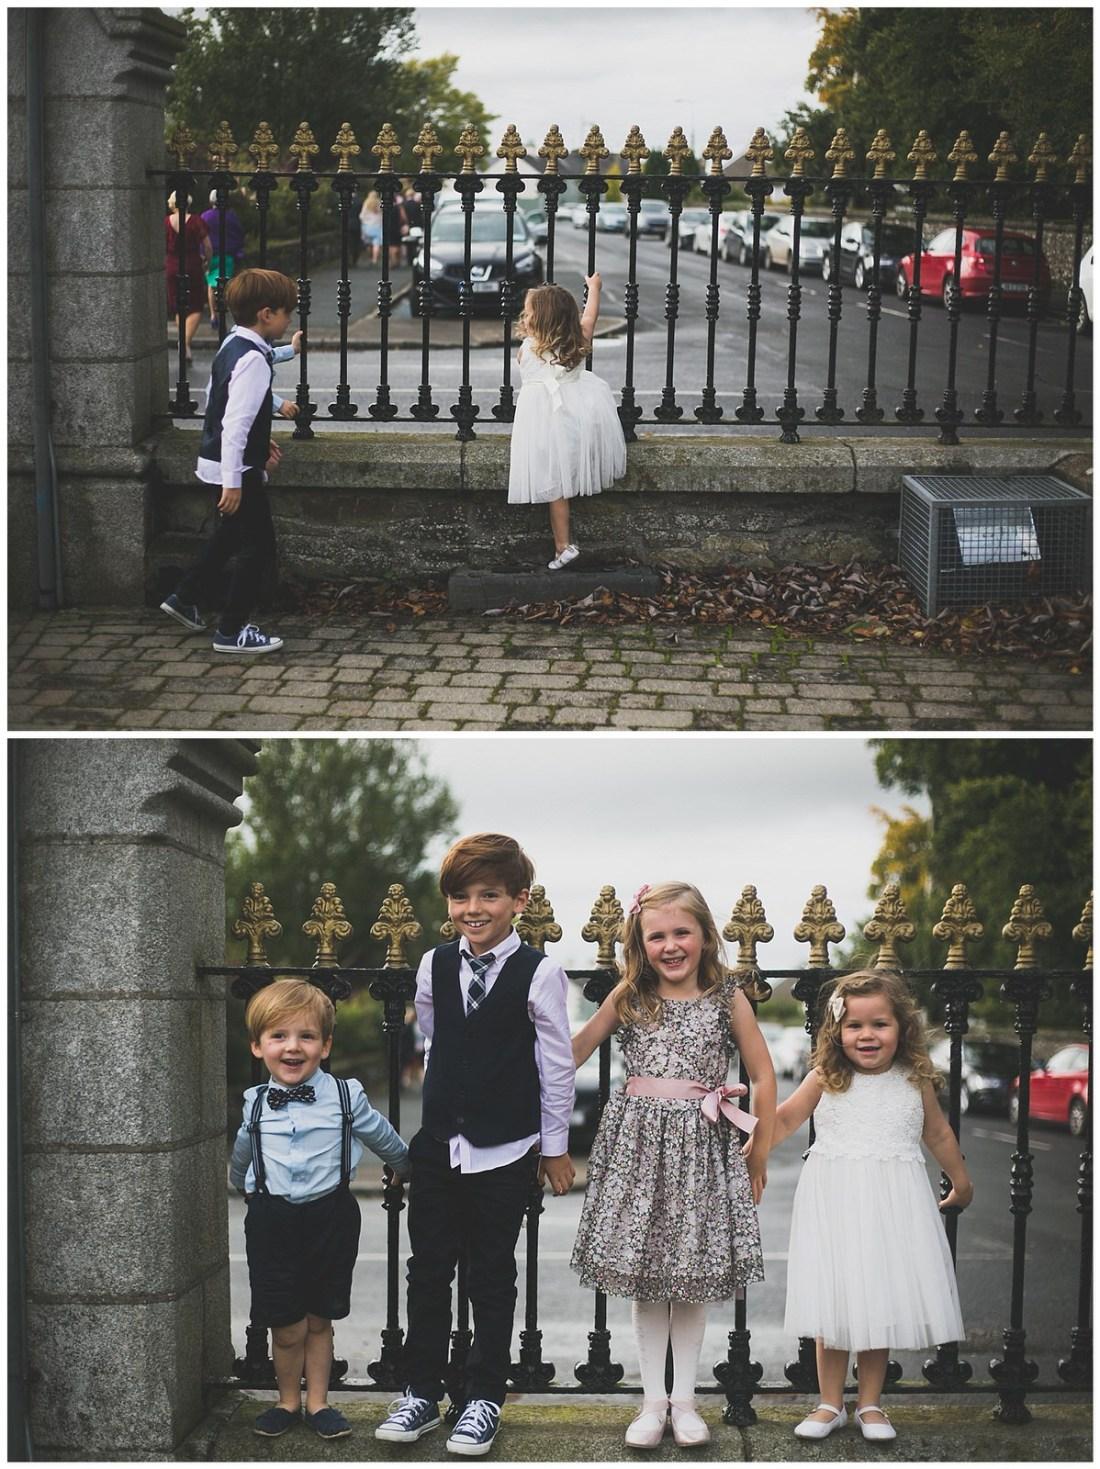 Cute shot of kids at a wedding